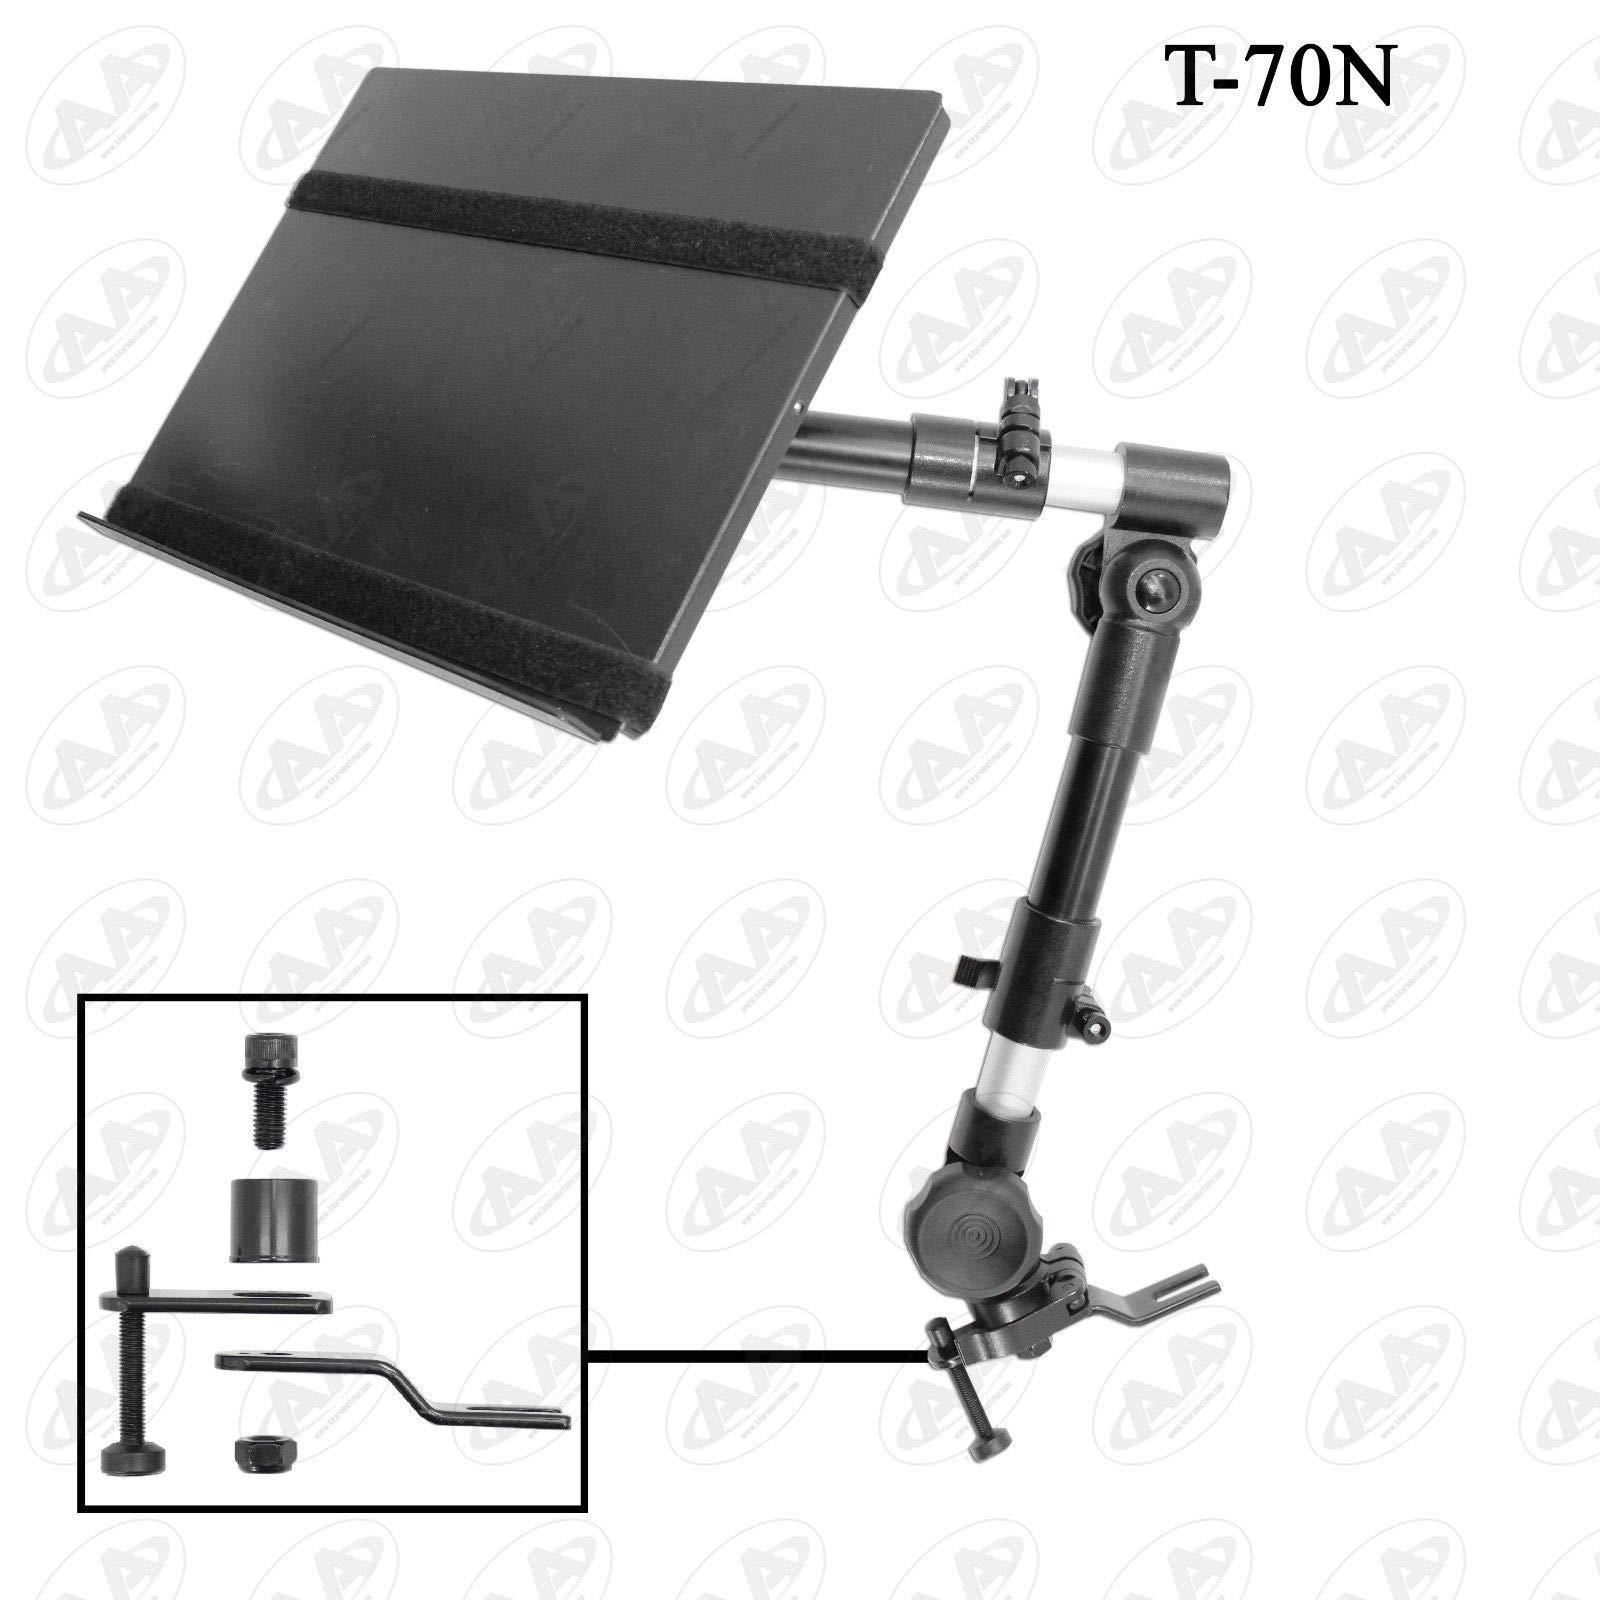 HERCHR Car Laptop/Notebook Holder, Automotive Truck Van Vehicle Mount Lightweight Holder, Black